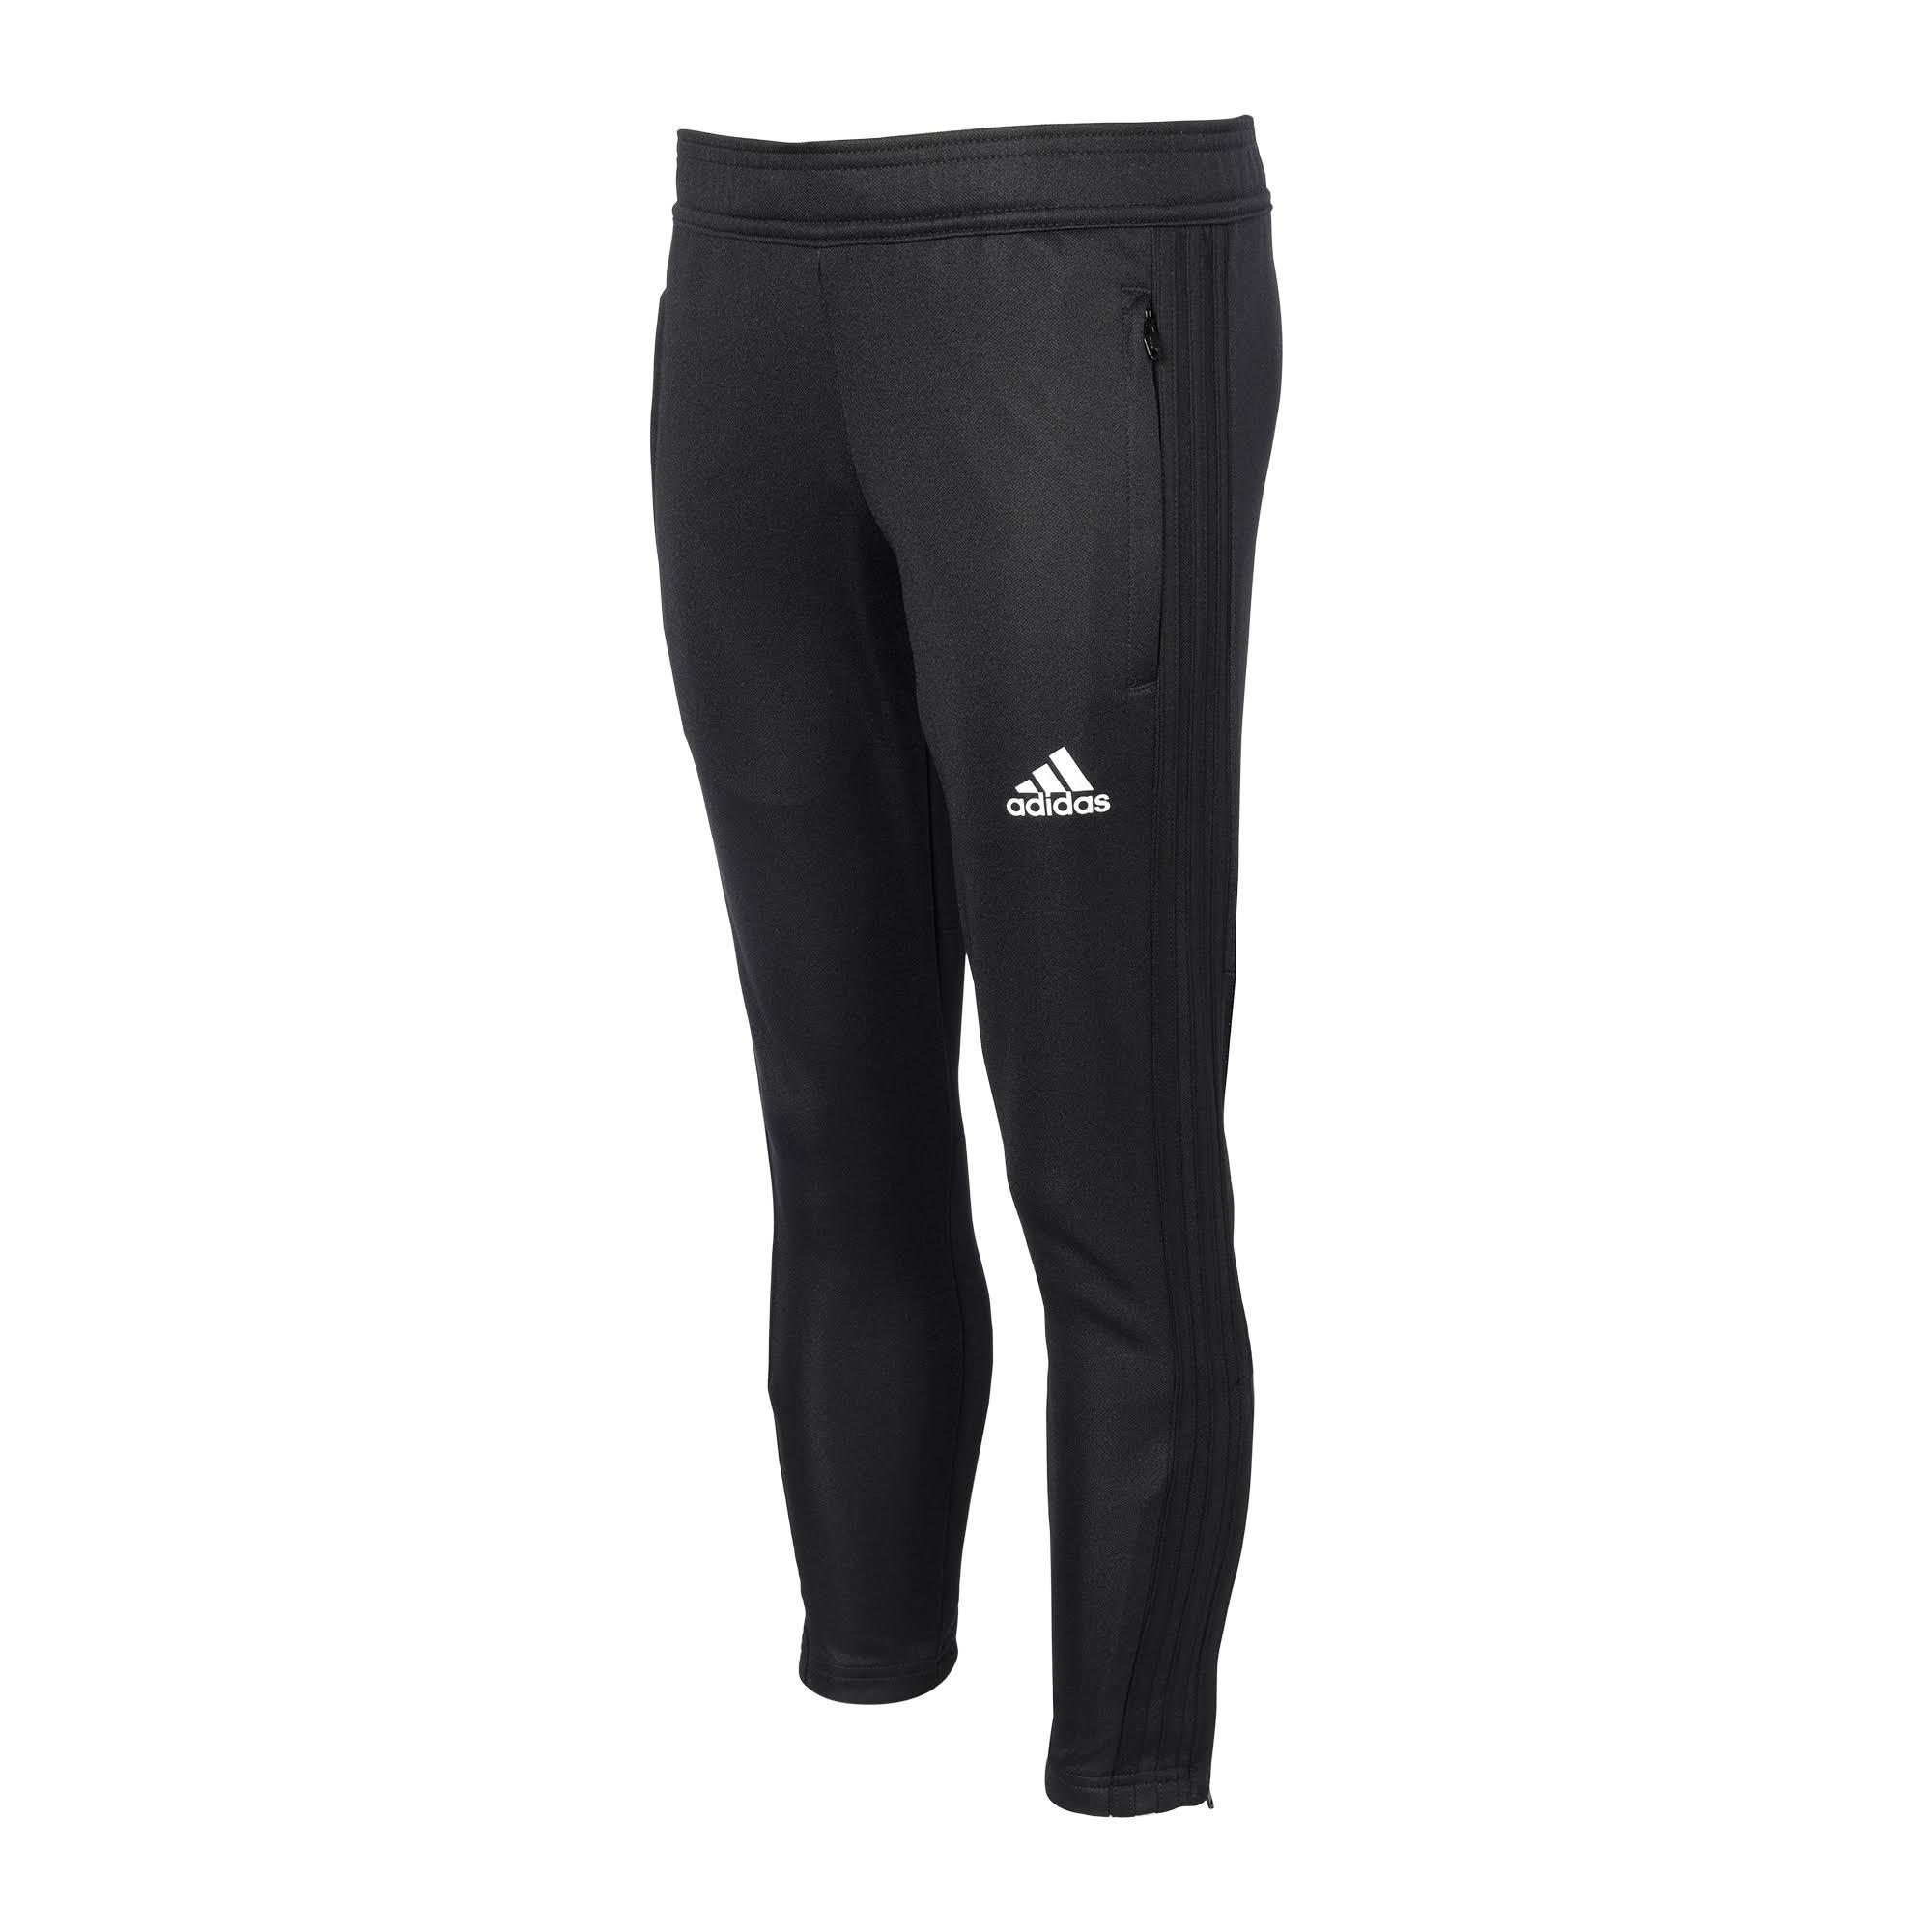 Adidas Condivo 18 Training Pants - Black/White